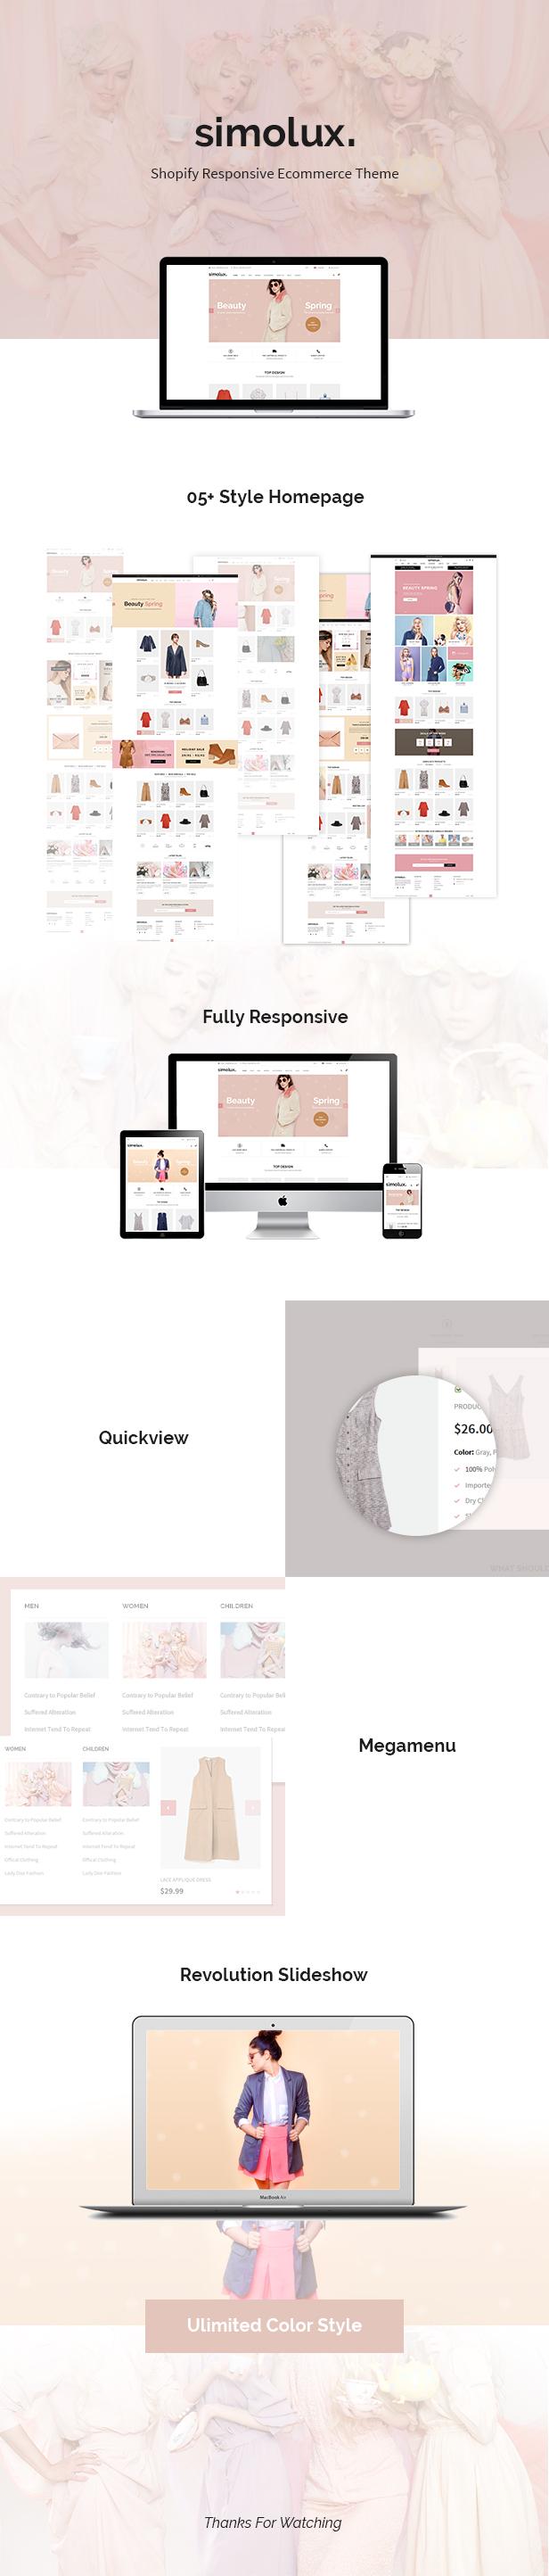 Simolux - Responsive Shopify Theme - 2